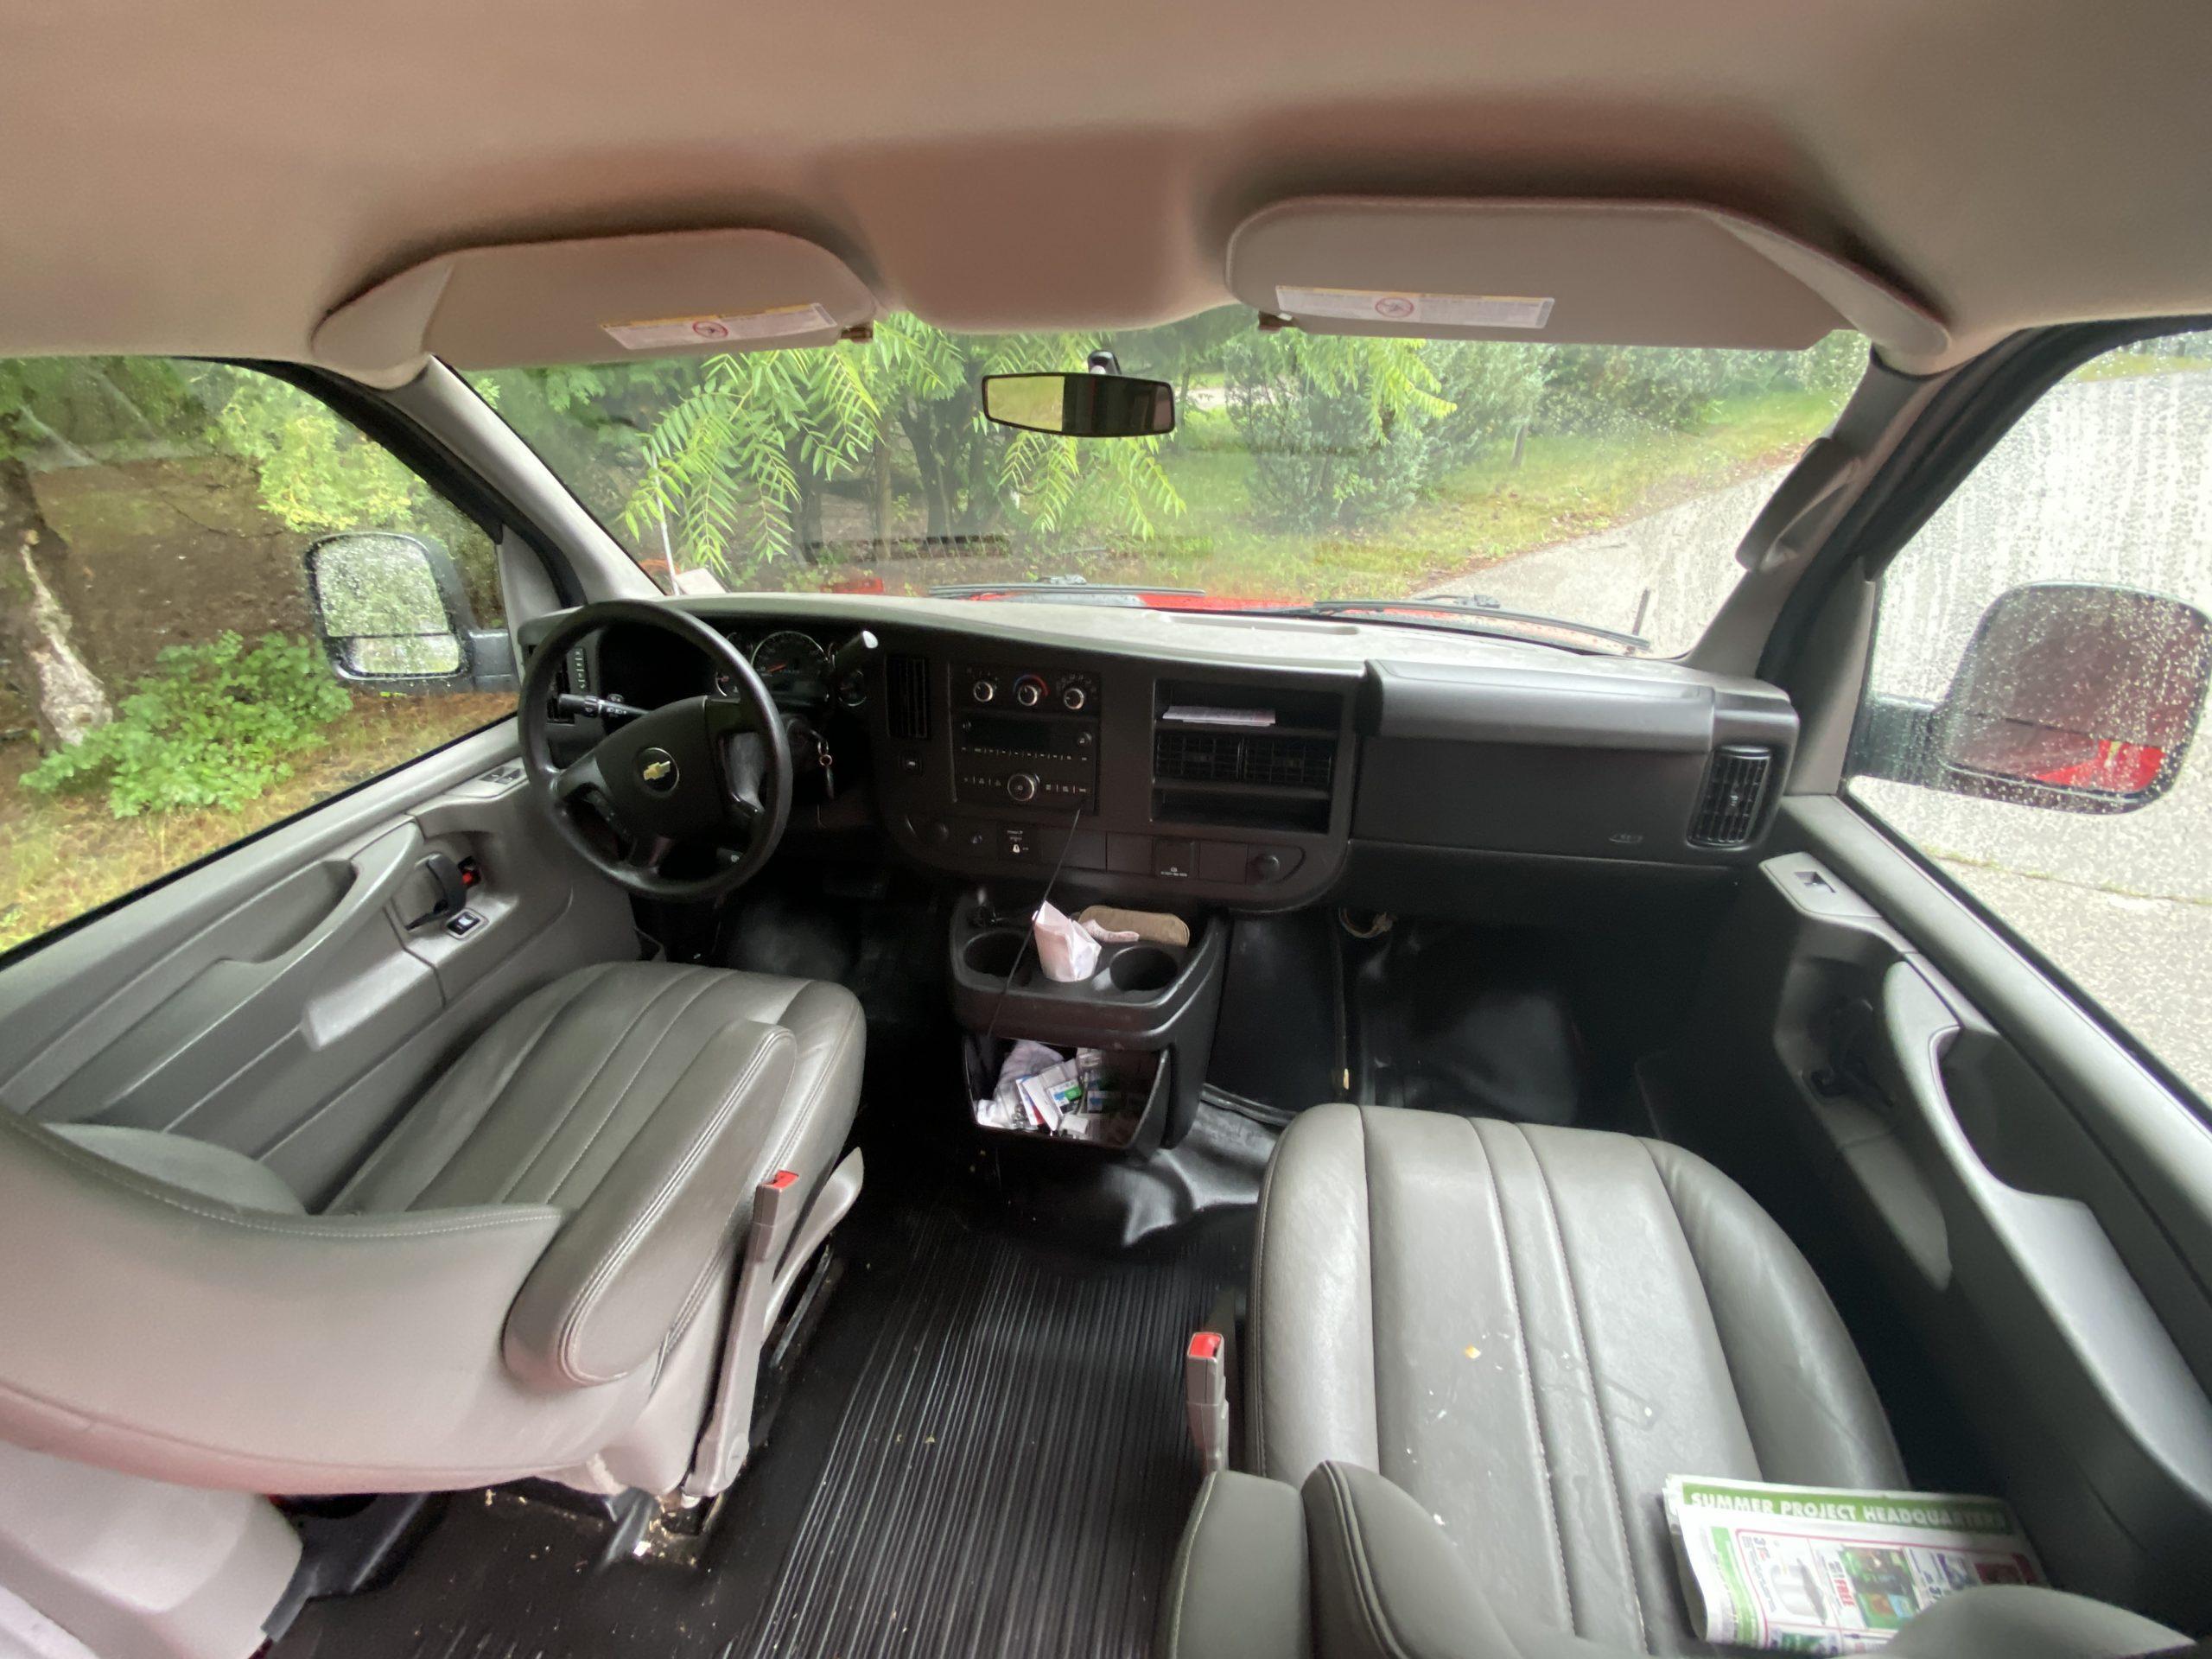 Chevrolet Express interior